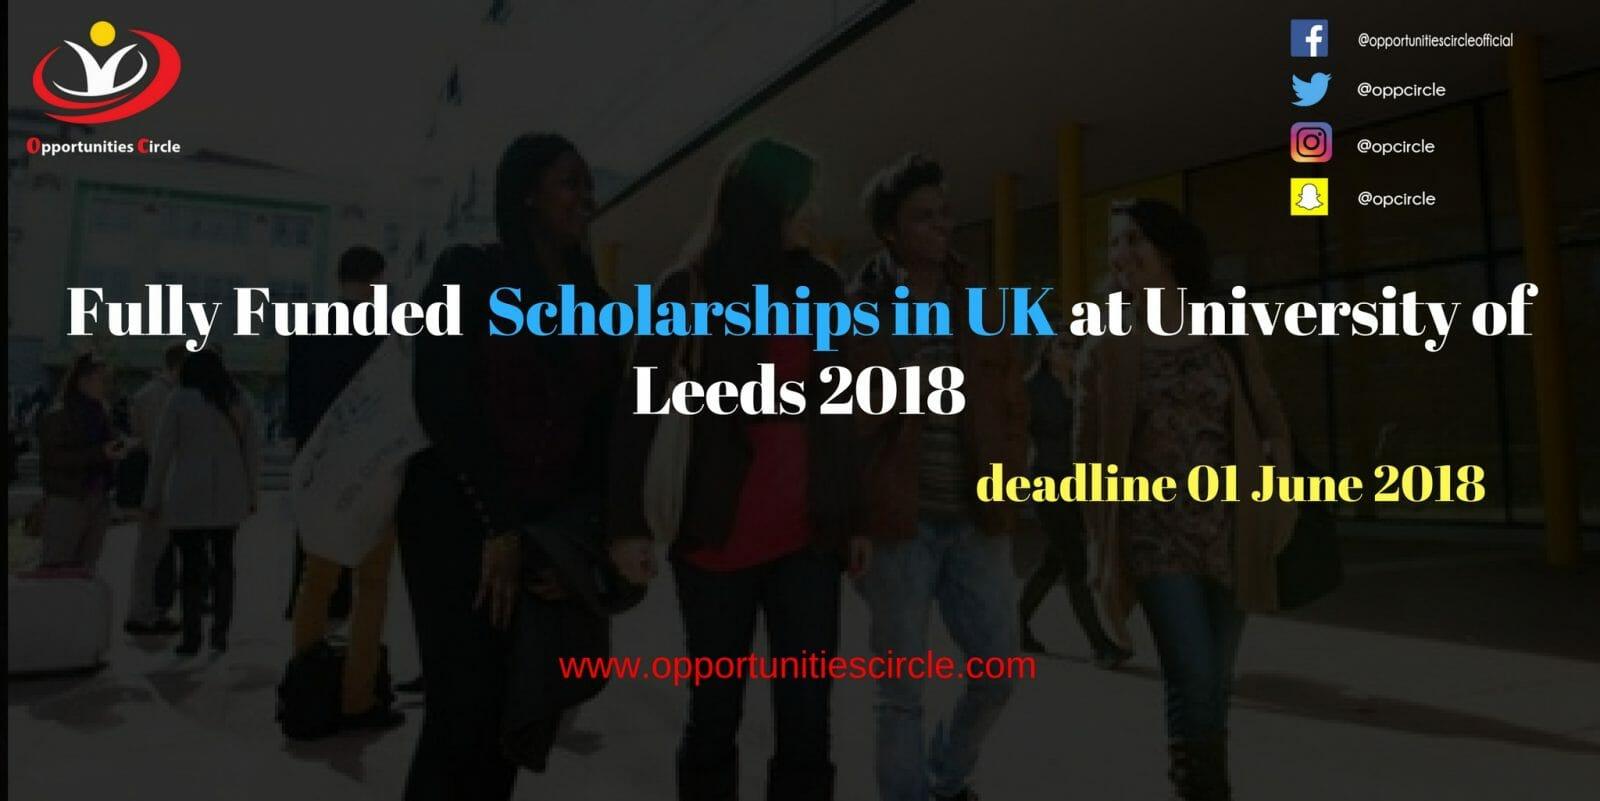 University of Leeds - Wikipedia